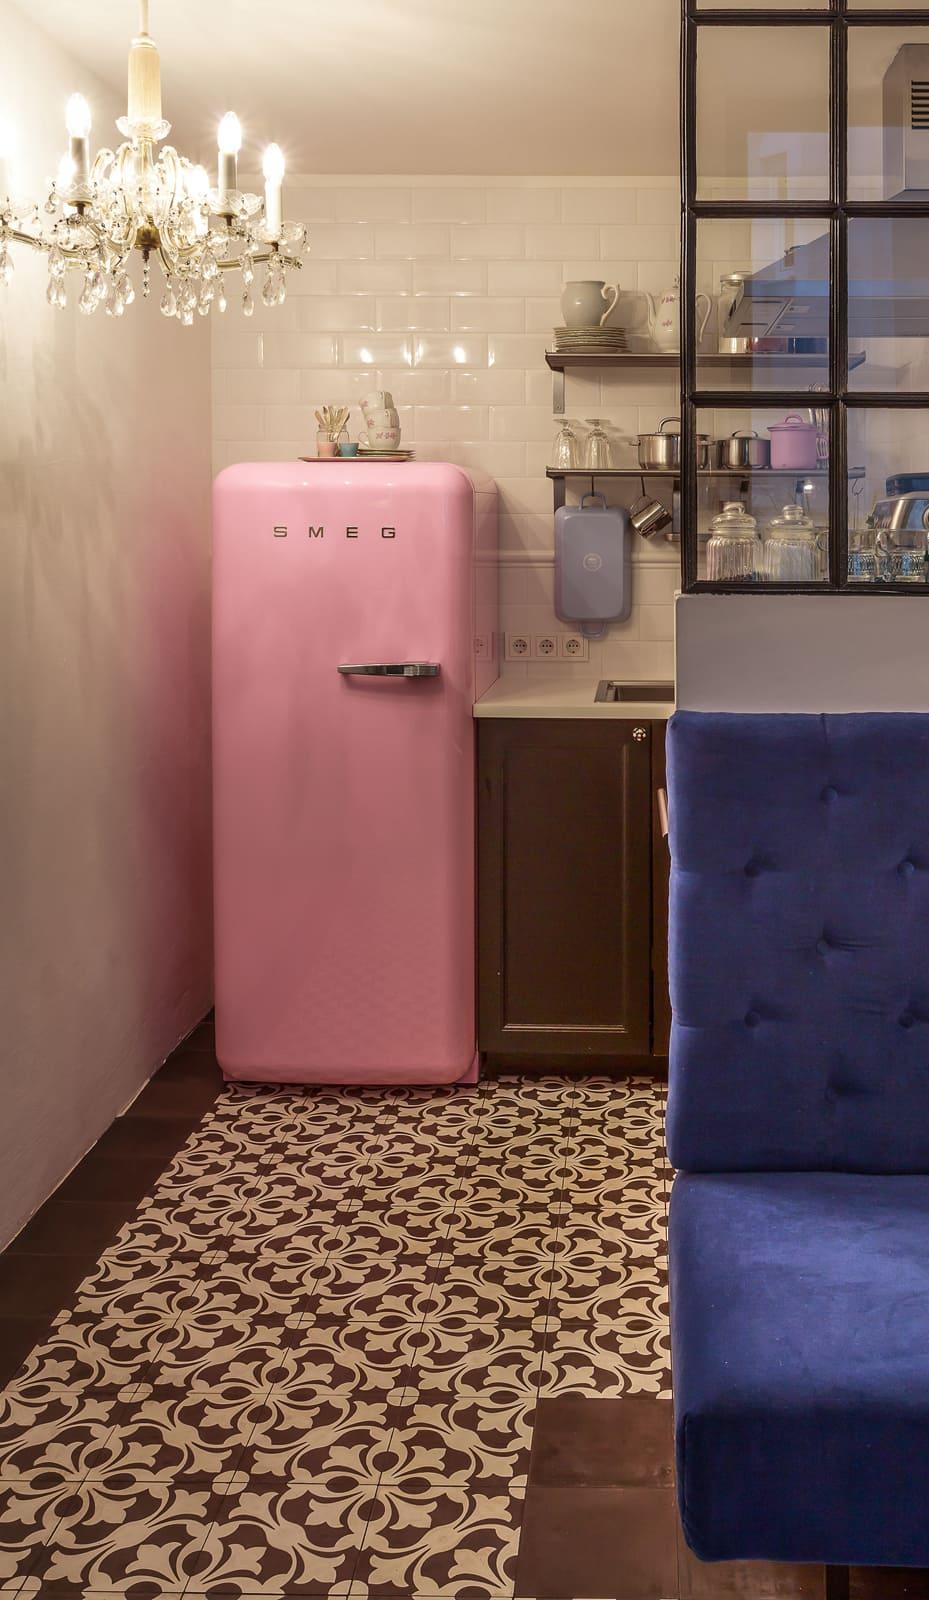 zementfliesen-terrazzofliesen-kreidefarbe-terrazzo-fugenlos-viaplatten-14260-hotel | 14260